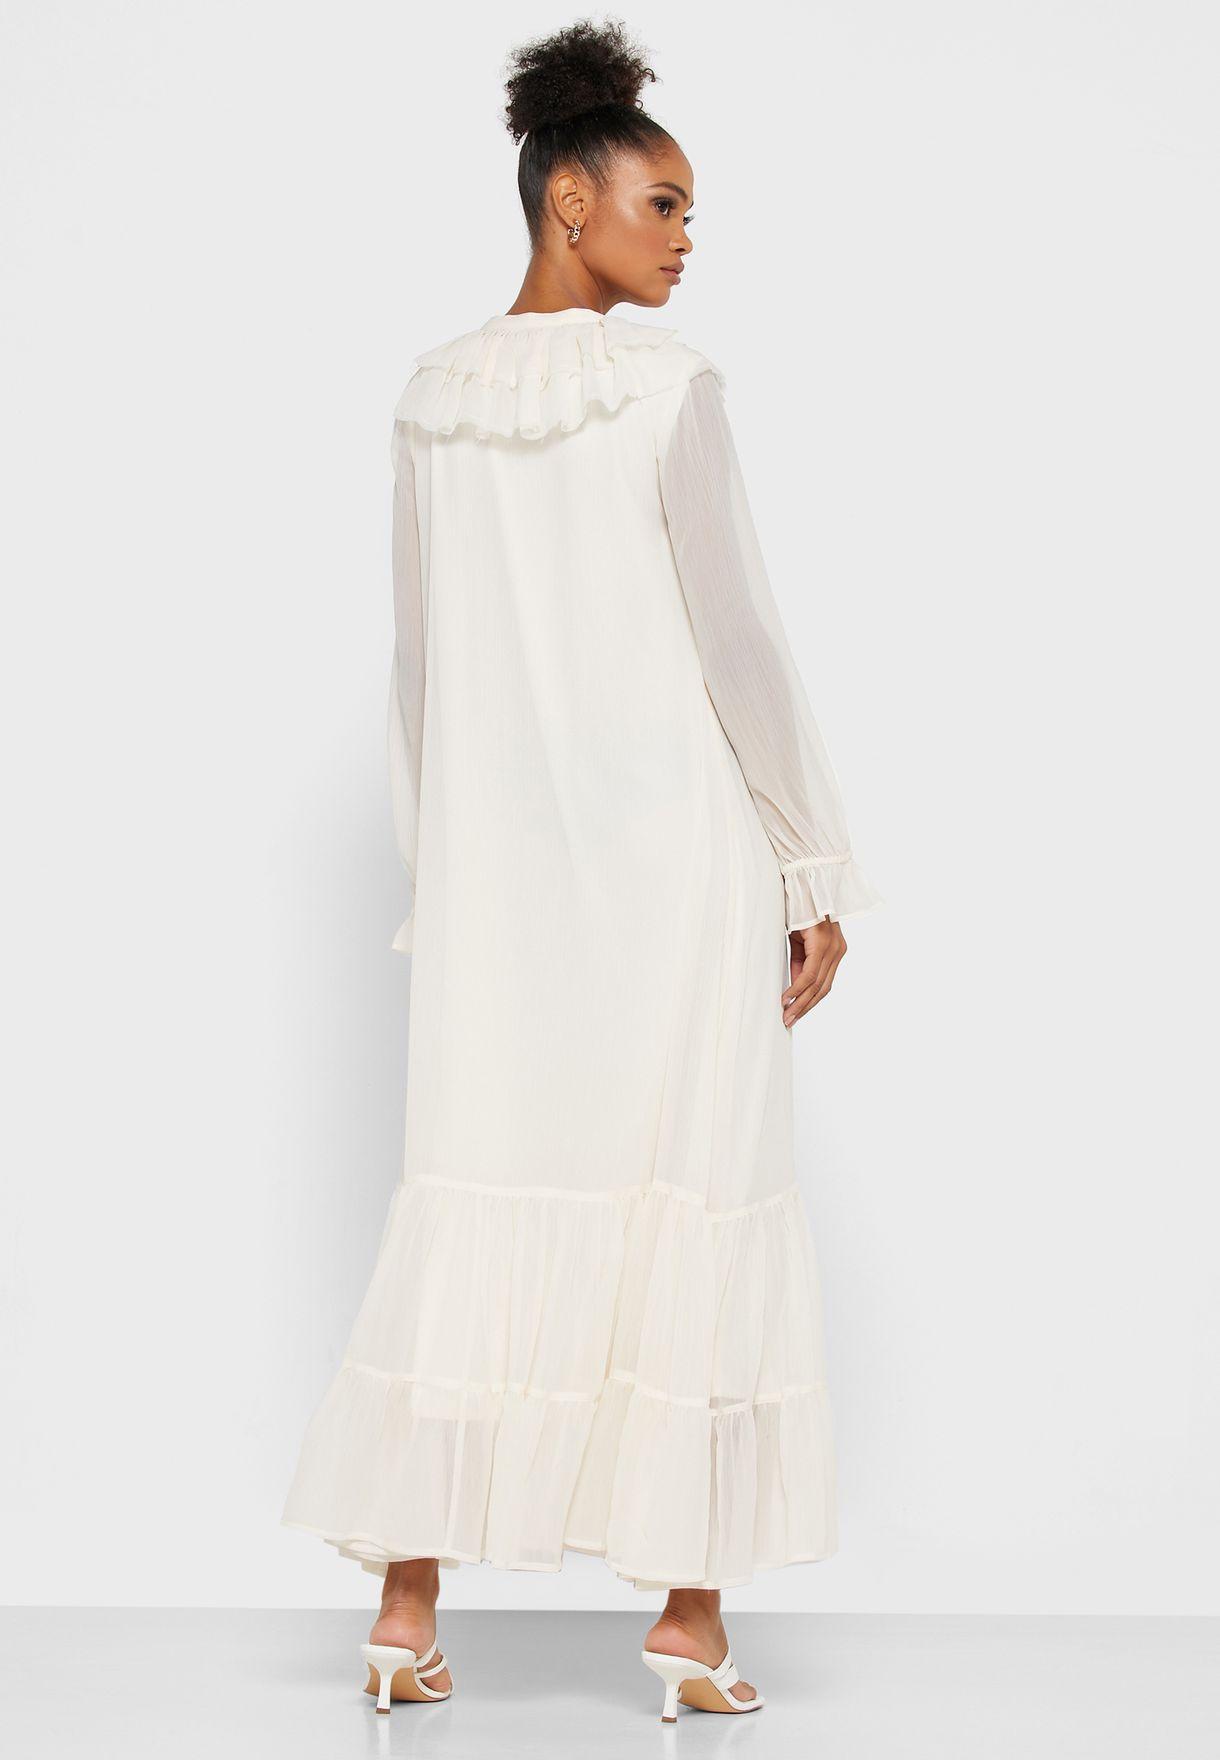 فستان شيفون مزين بكشكش